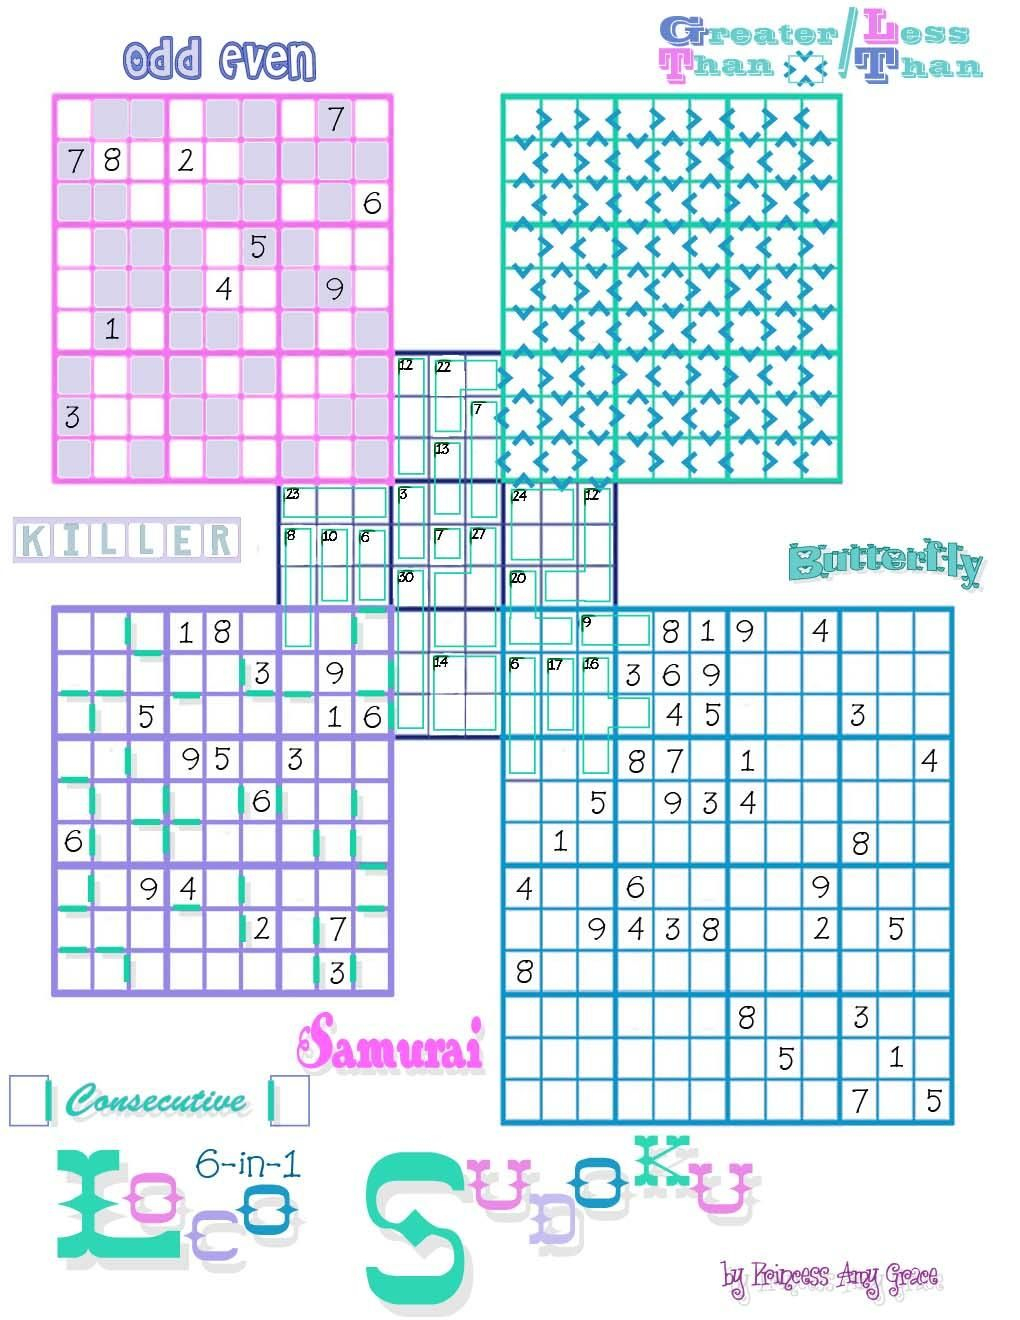 Loco Sudoku | Puzzles---Crossword-Sudoku-Jigsaw&???? | Puzzle - Printable Crossword Sudoku Puzzles